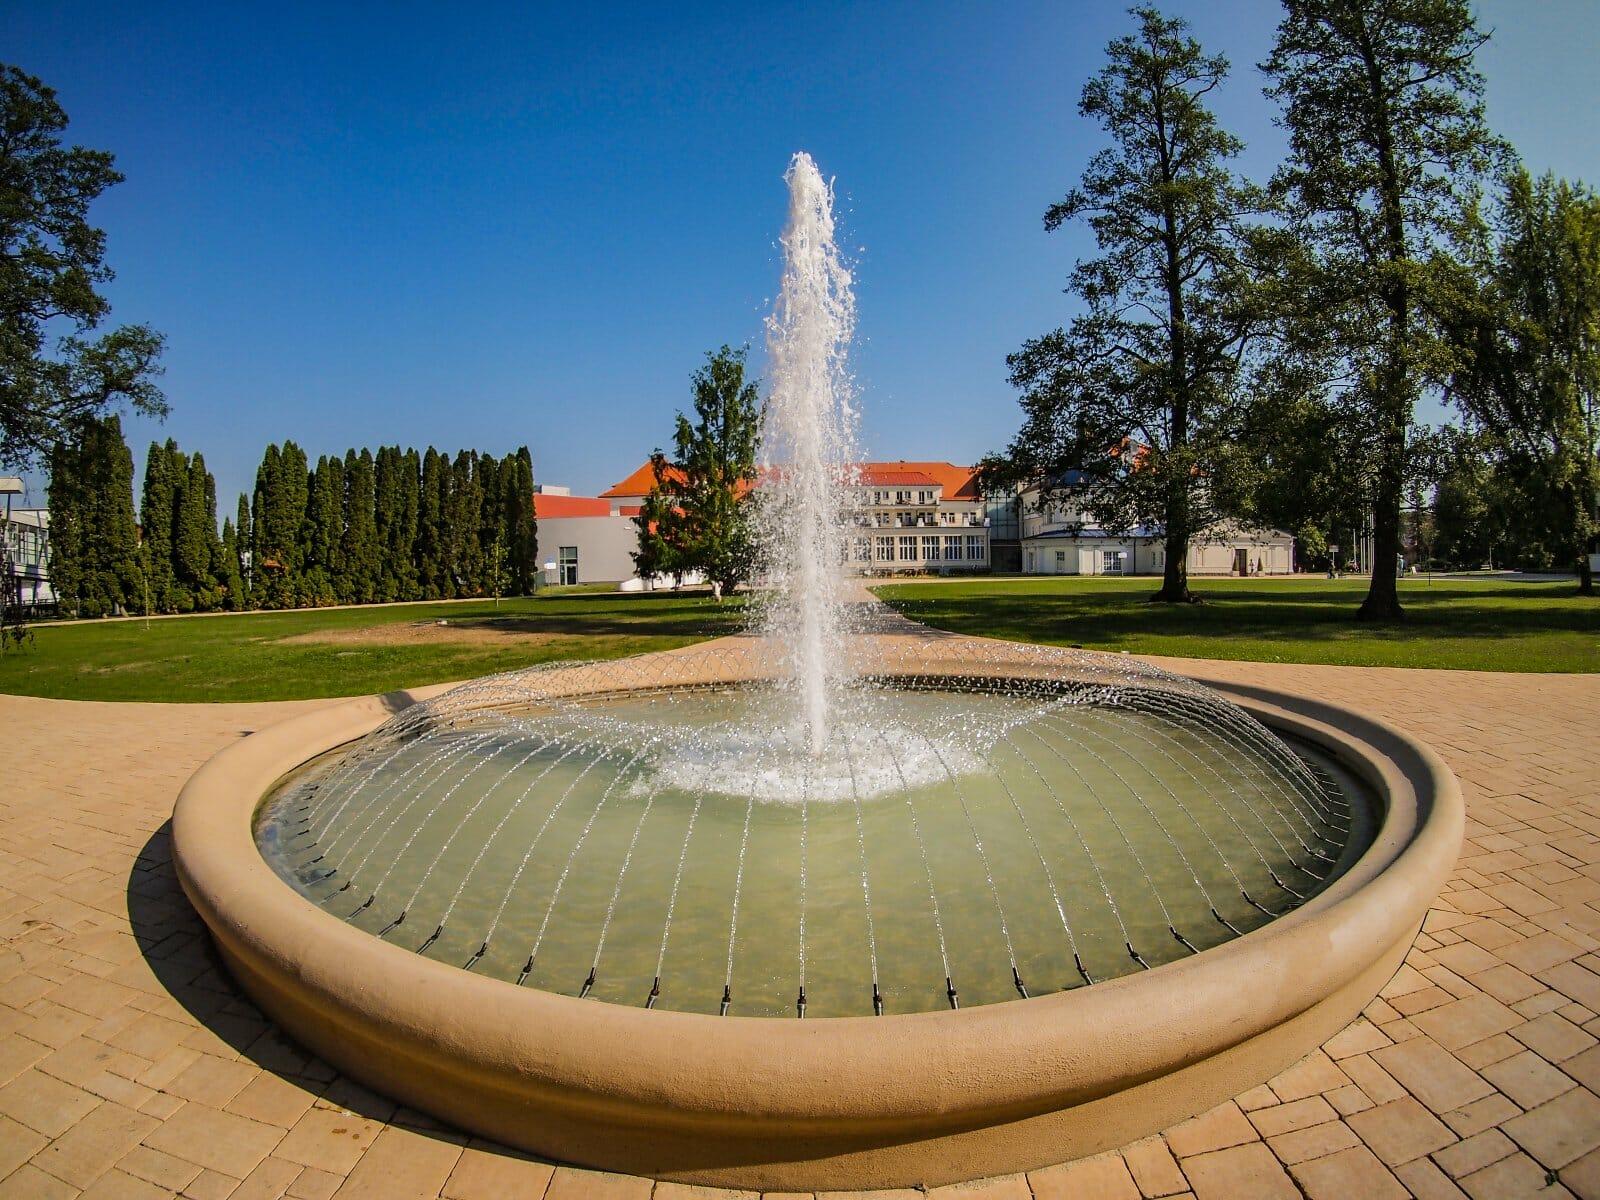 Fontána v Kúpeľoch Turčianske Teplice